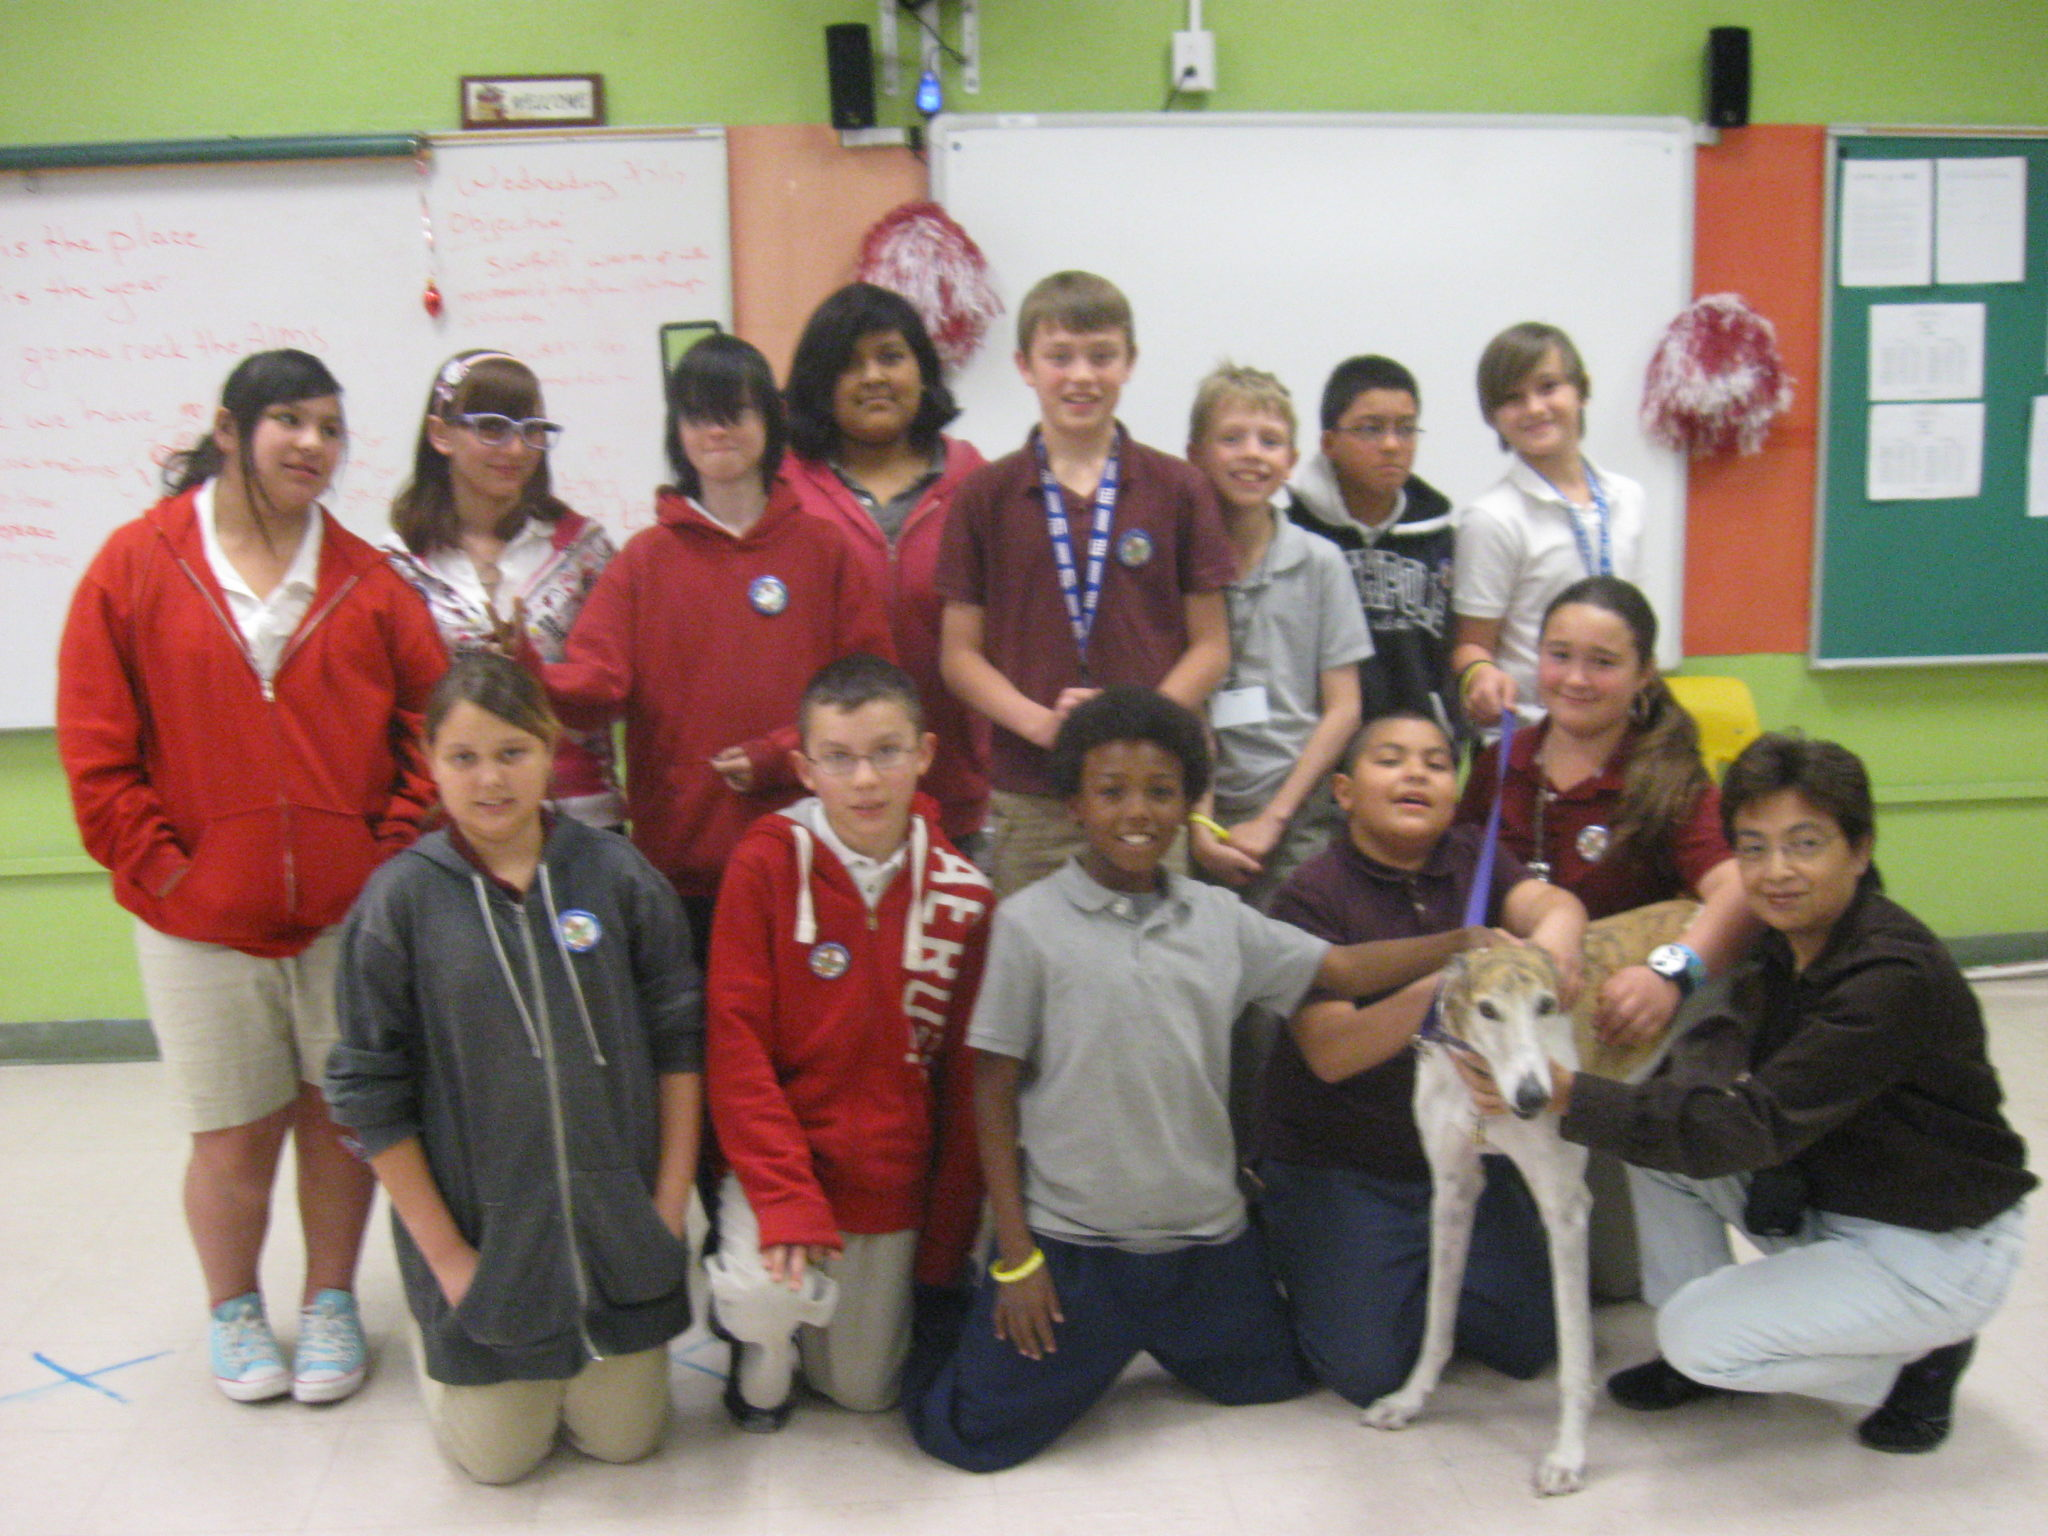 Jett greyhound goes to school